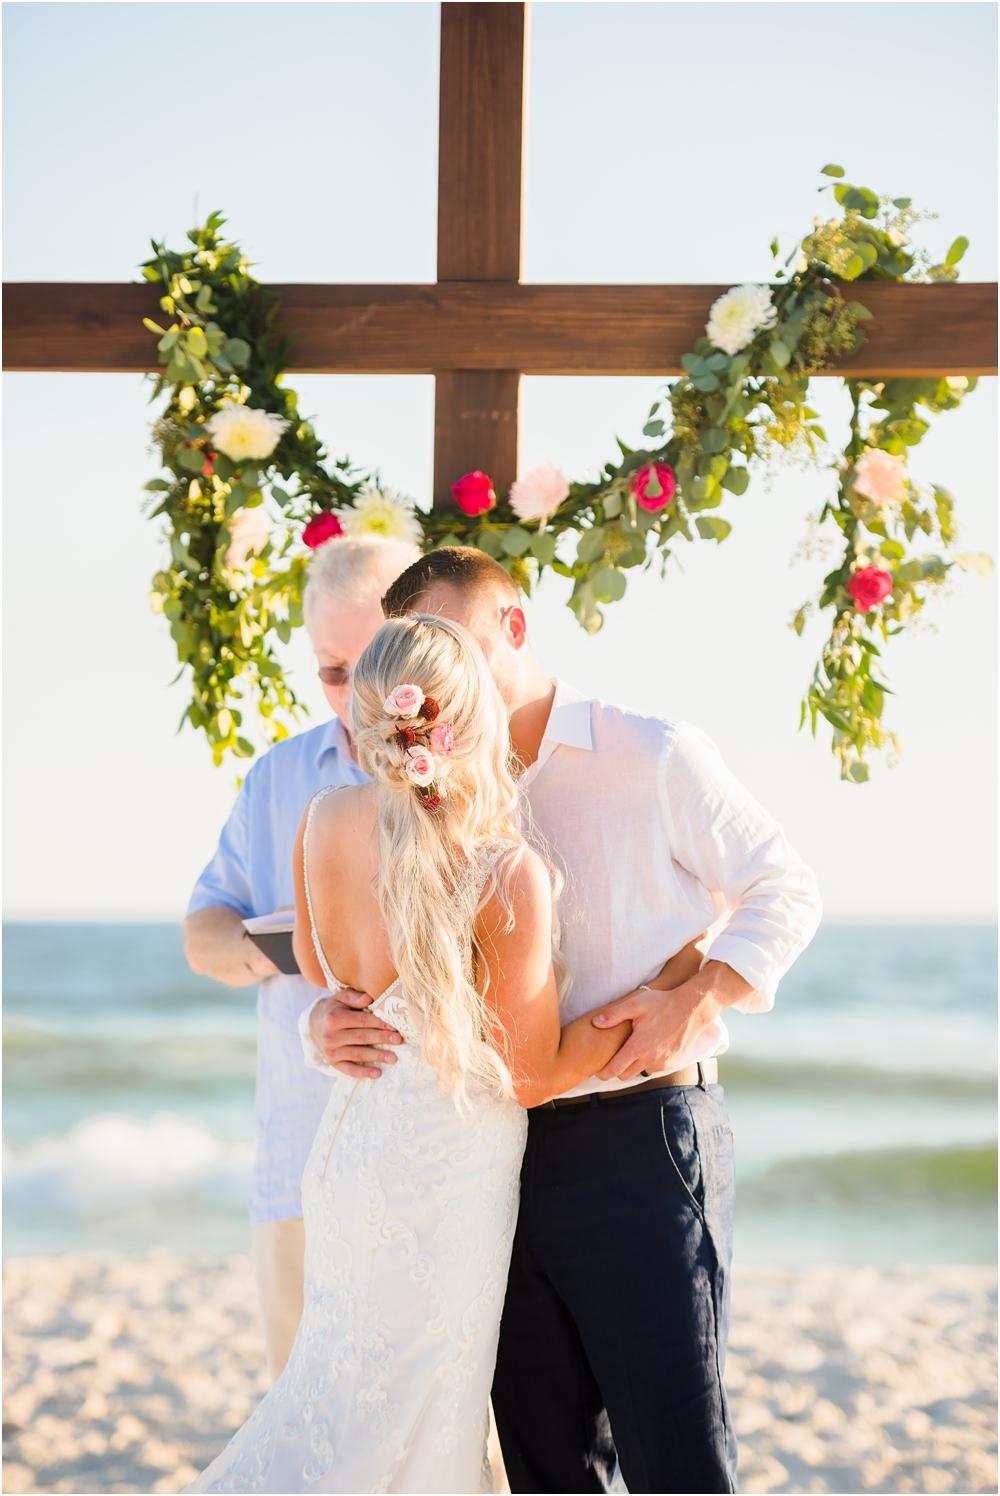 mcglothlin-wedding-kiersten-stevenson-photography-30a-panama-city-beach-dothan-tallahassee-(91-of-145).jpg